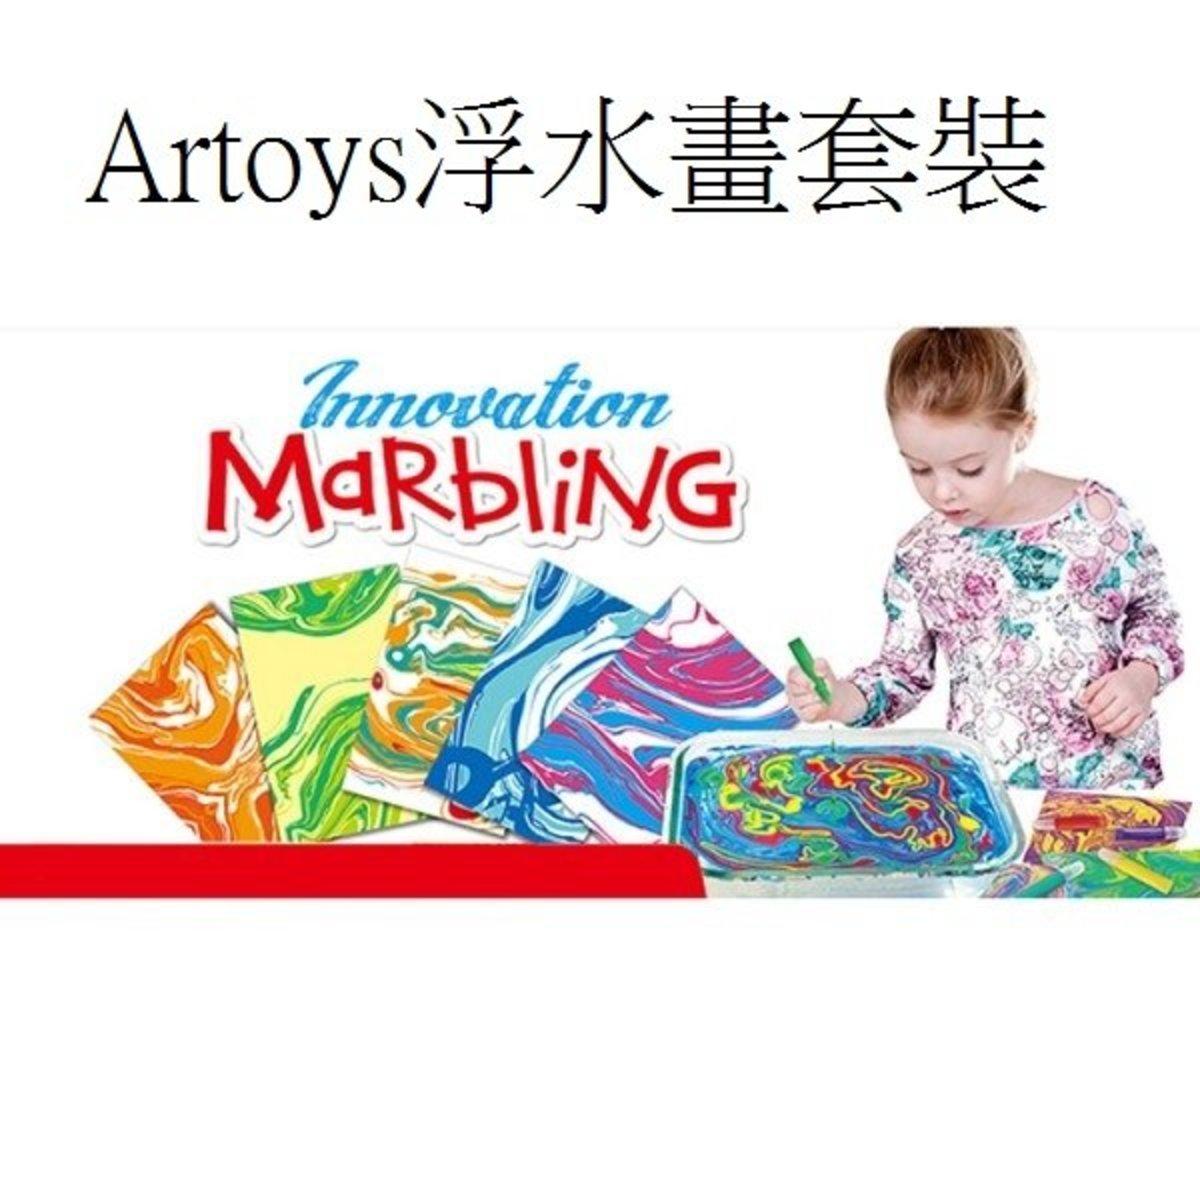 Artoys Floating Painting Set ( Marbling Painting)